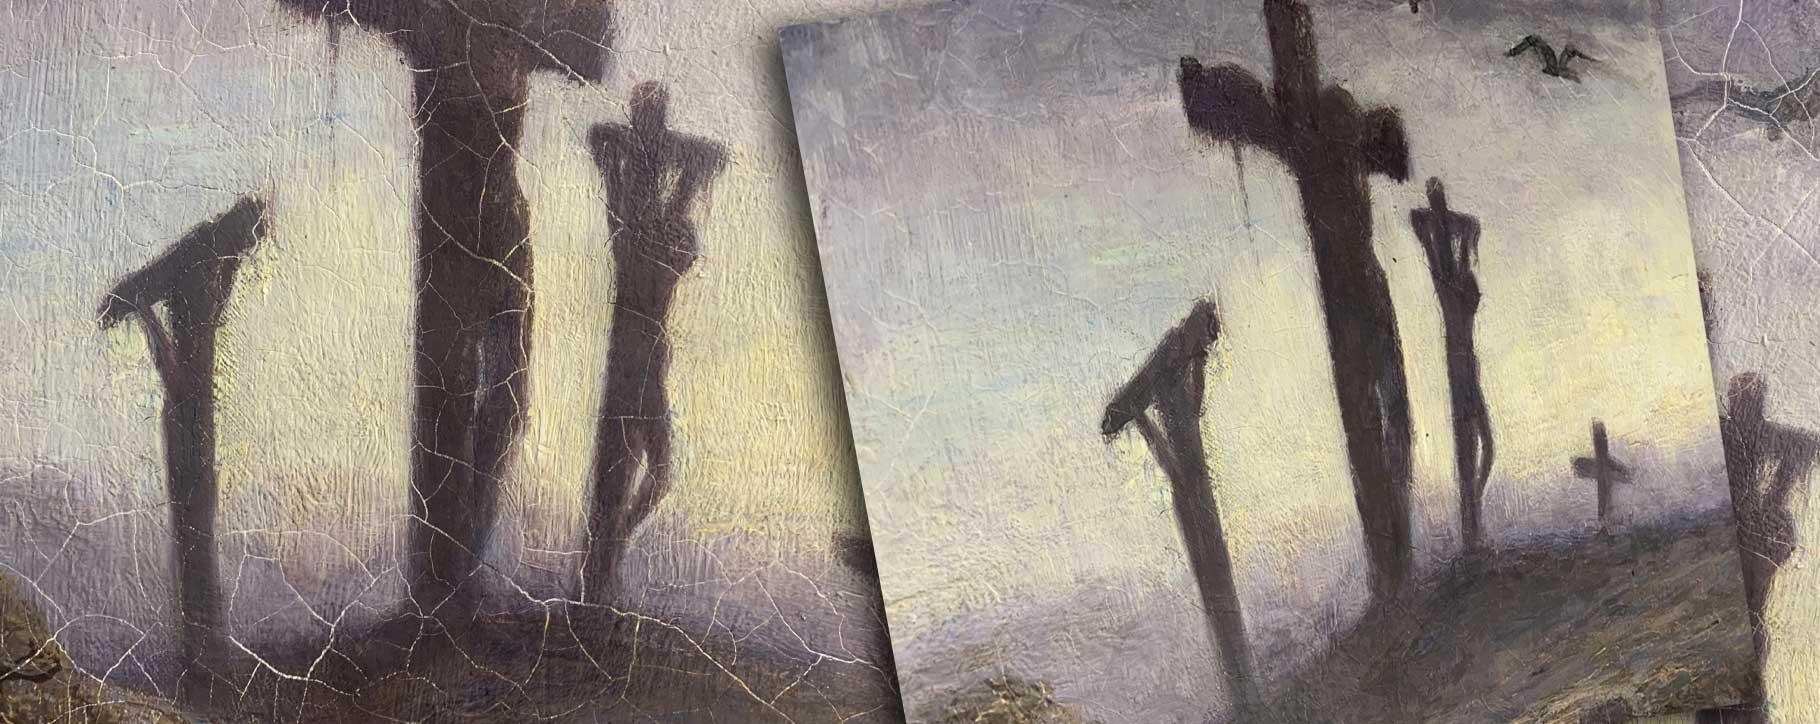 rizpah restoration crosses cracking